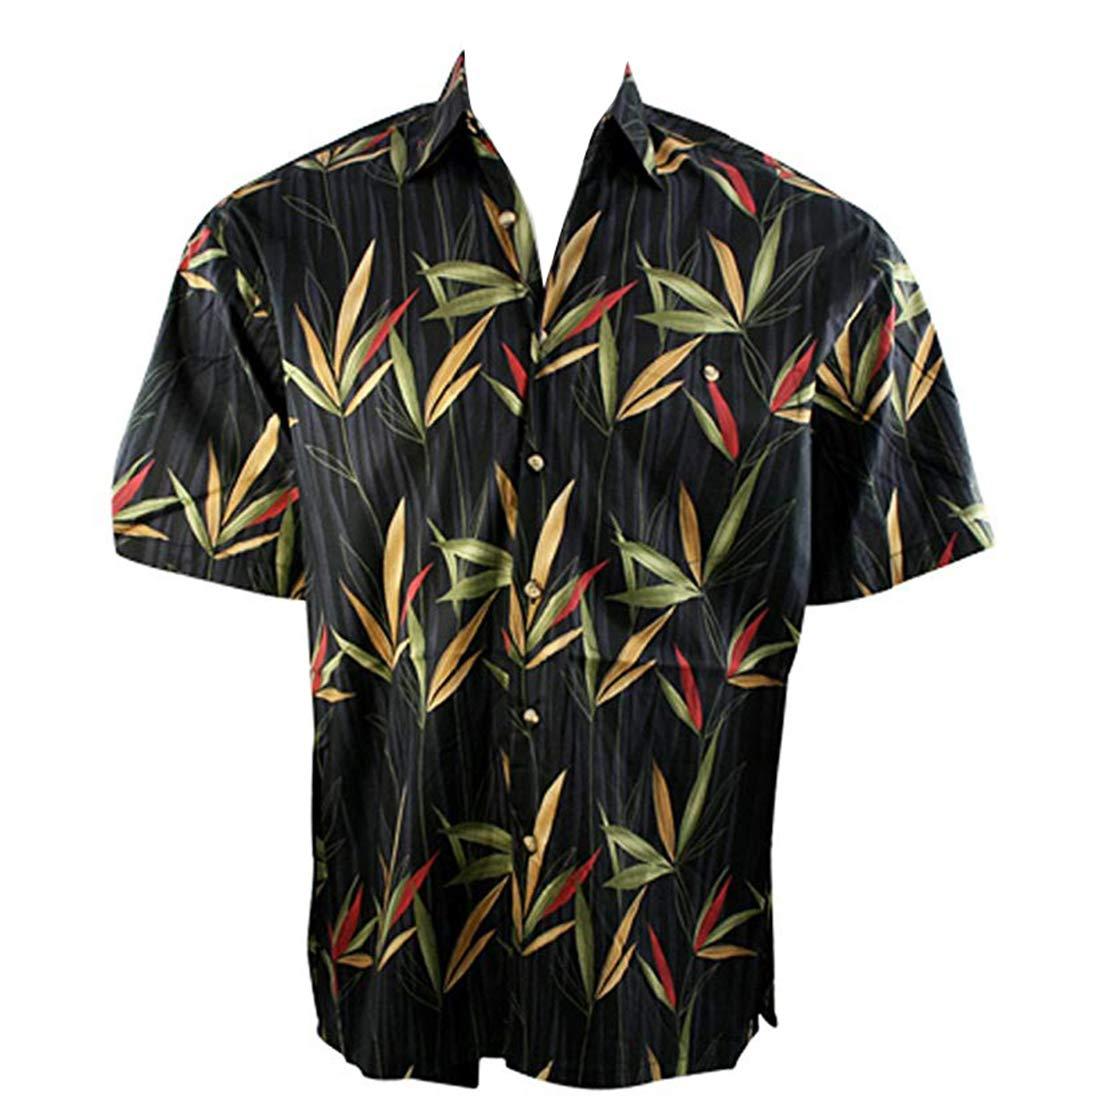 Bamboo Garden Tropical Style Black Colored Button Front Shirt Bamboo Cay